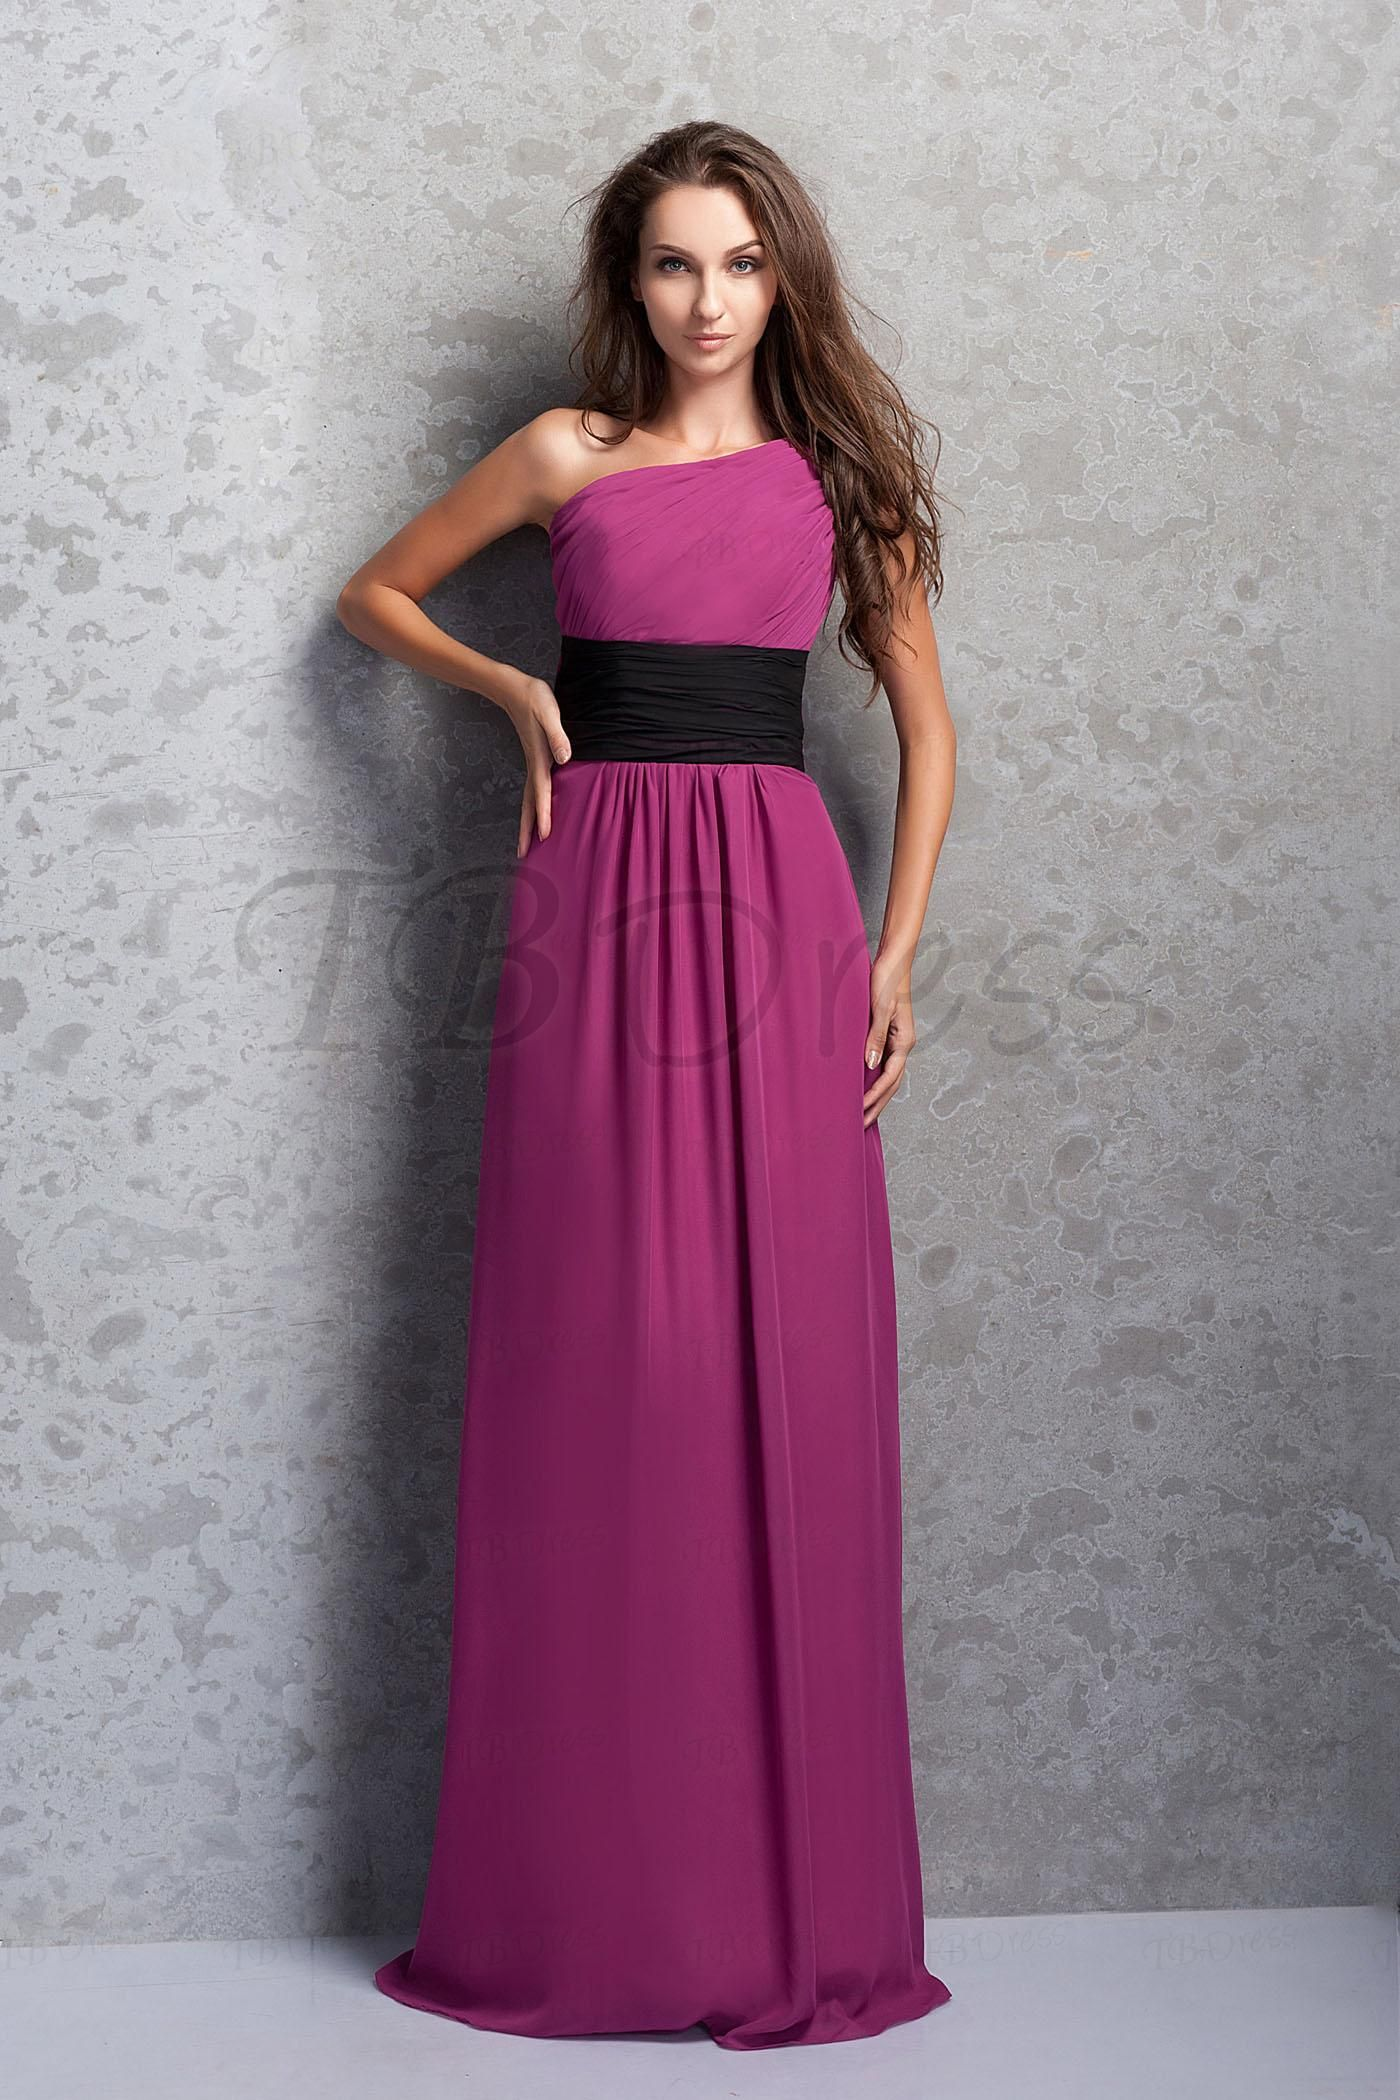 Empire Waist A-line One-Shoulder Long Prom/Bridemaid Dress   Prom ...